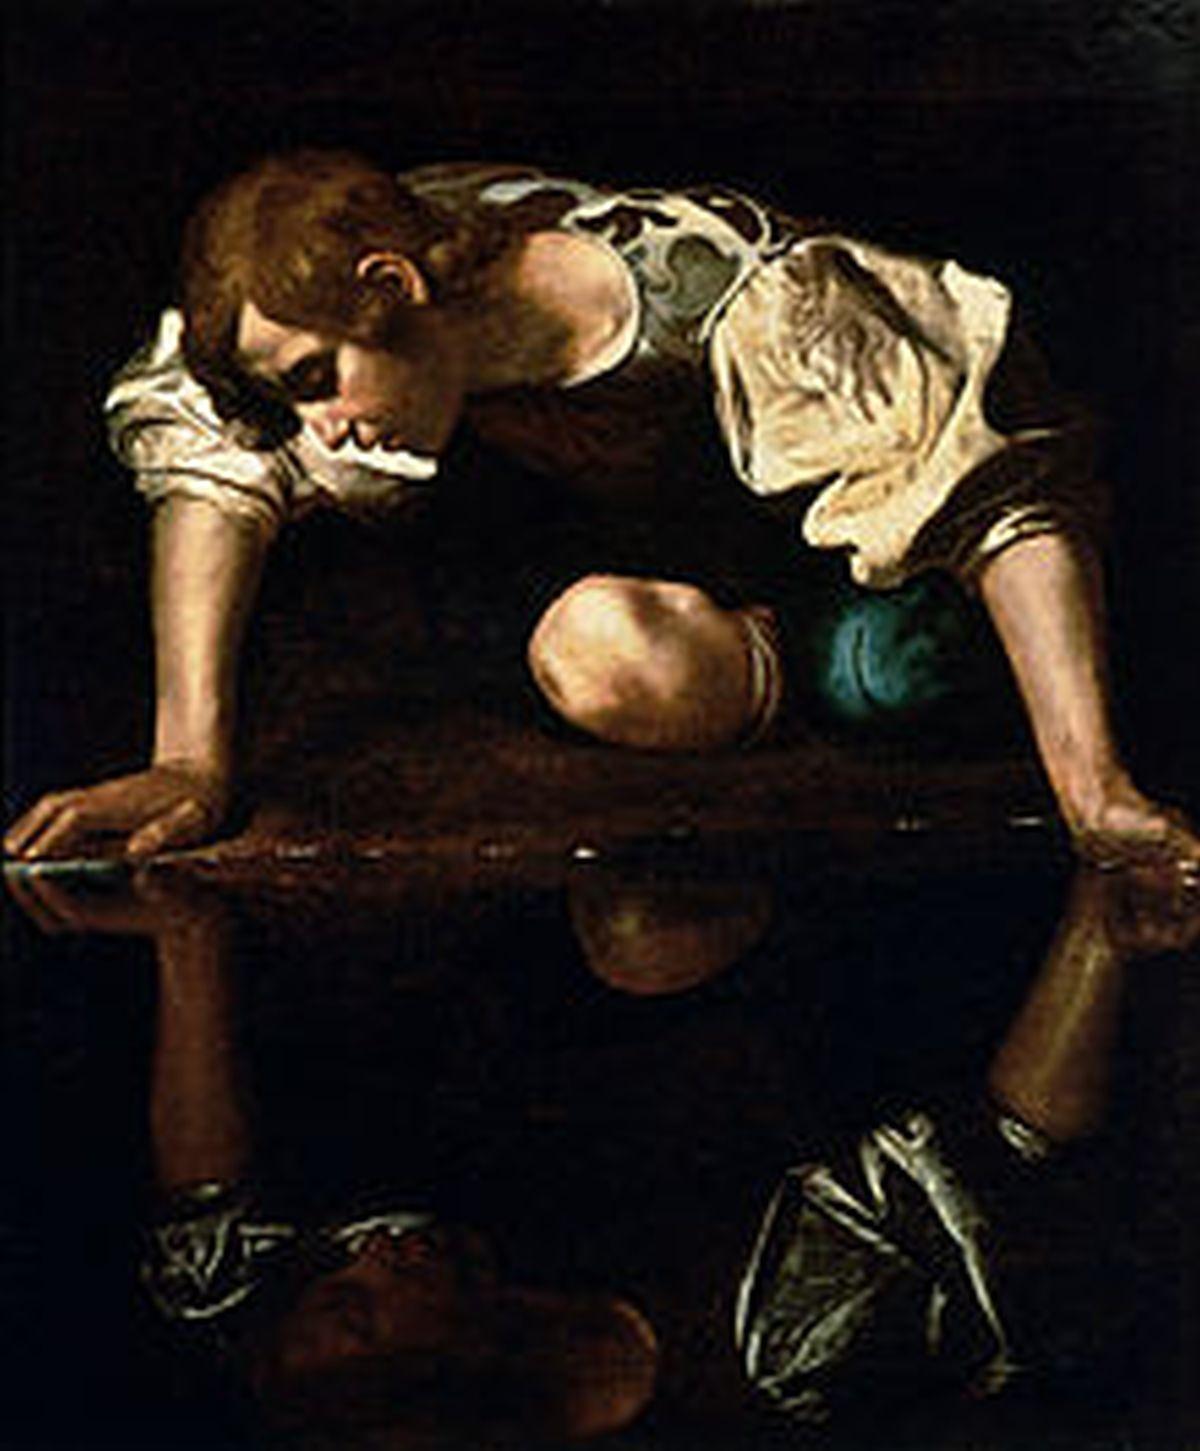 Narcissus Opens Instagram Account